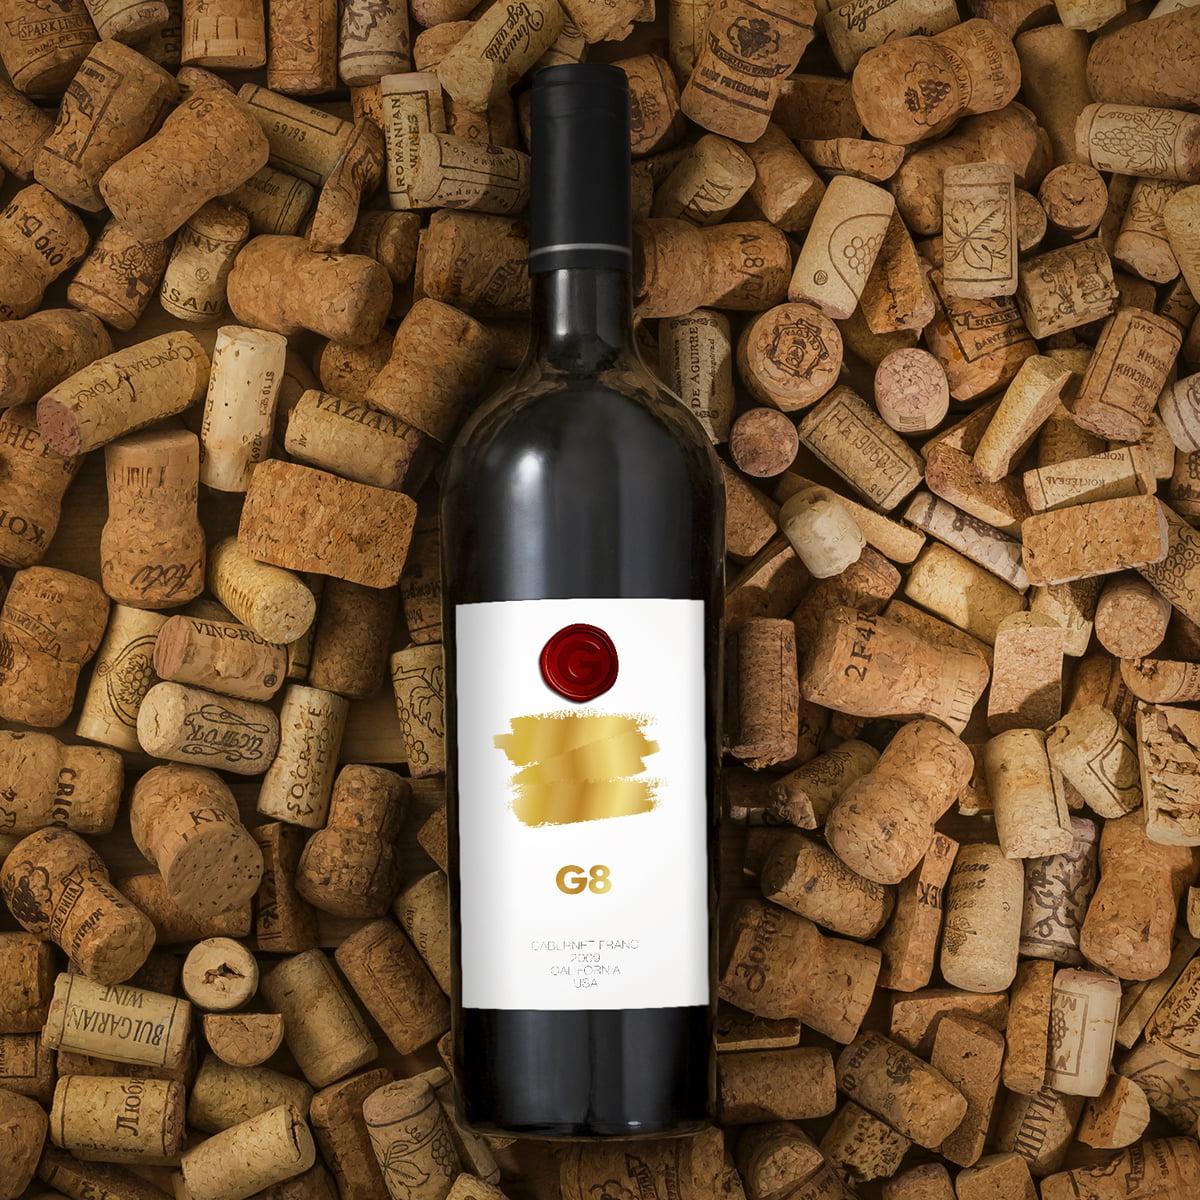 G8 Wine Label